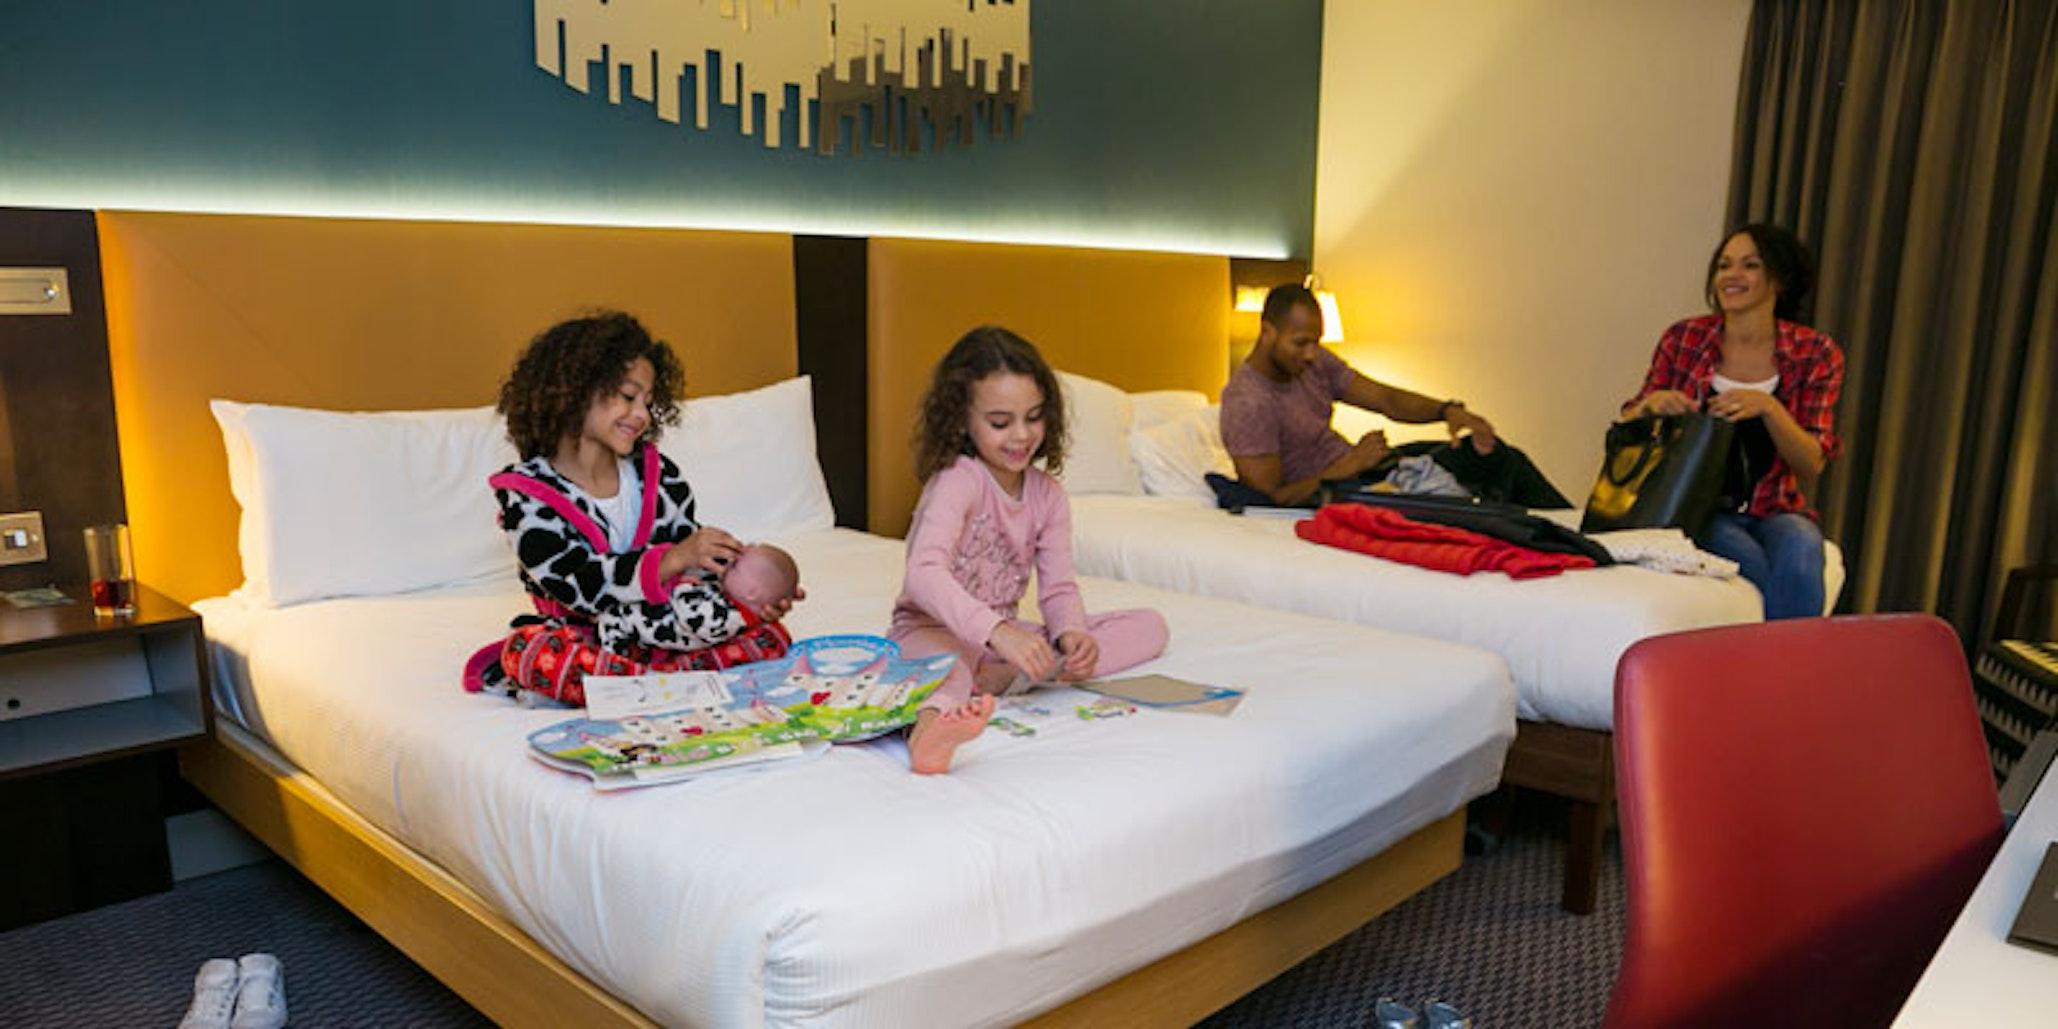 Hilton Bracknell Hotel near THORPE PARK Resort